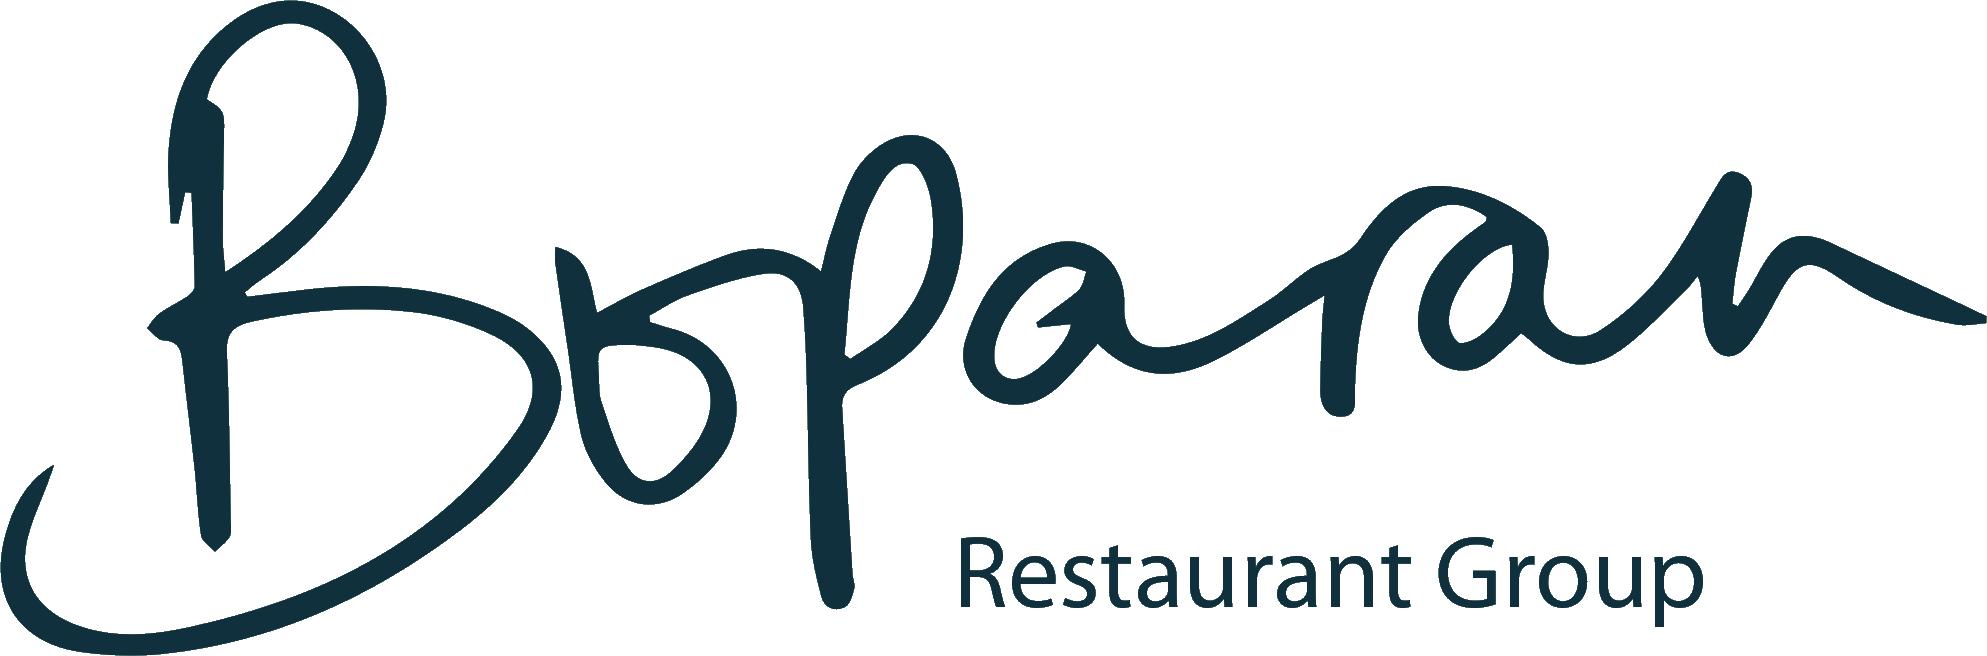 Boparan - Restaurant Group